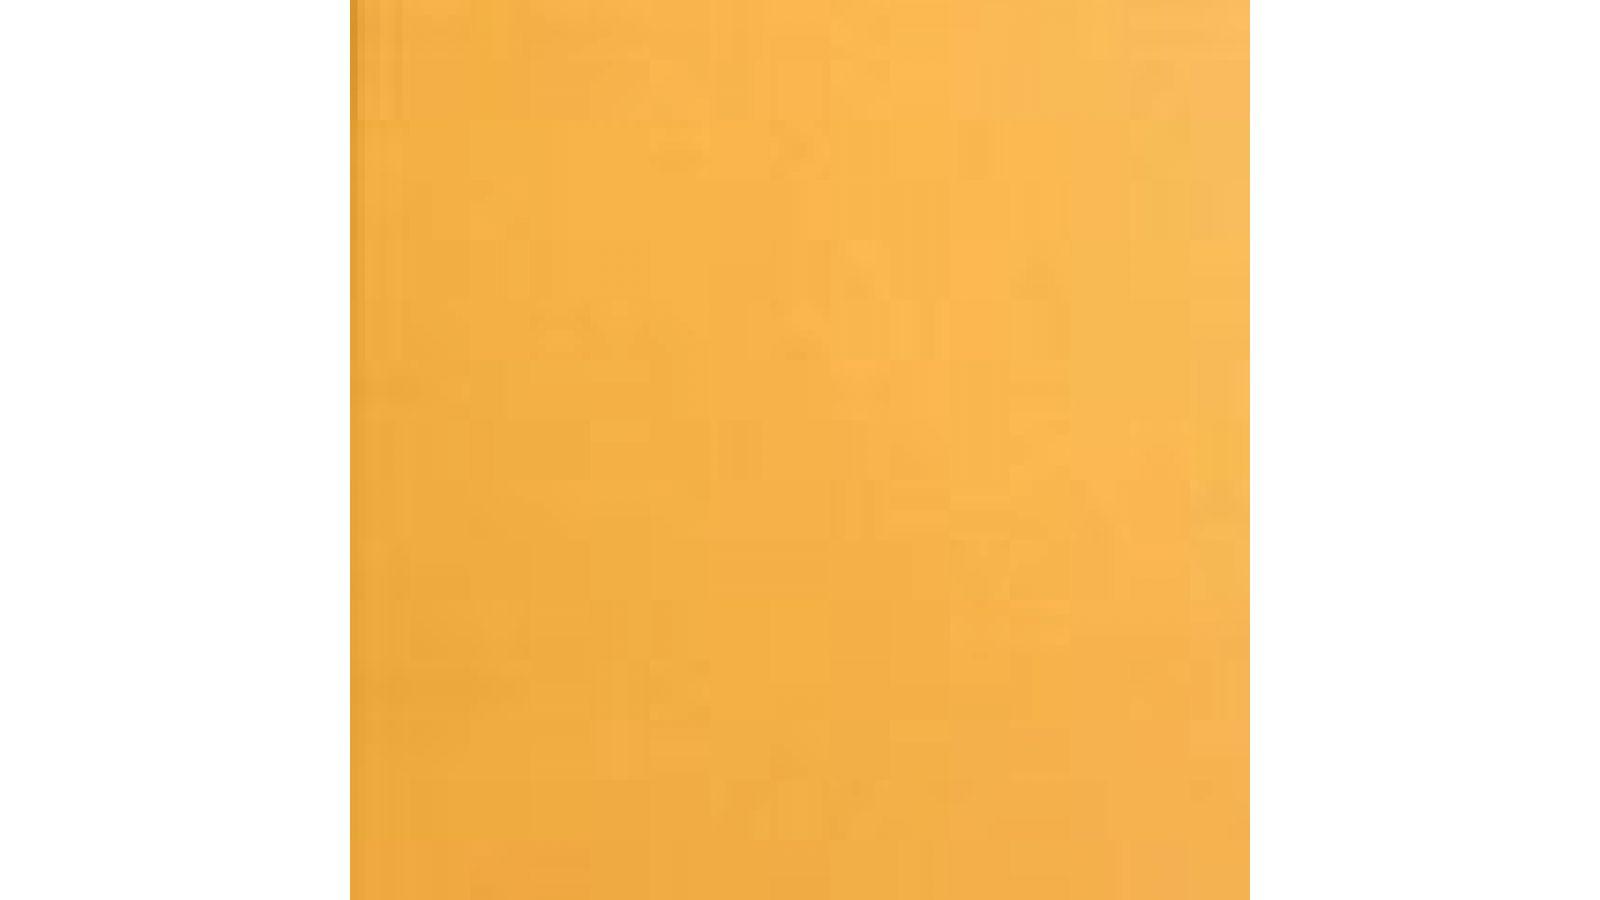 Olean Yellow